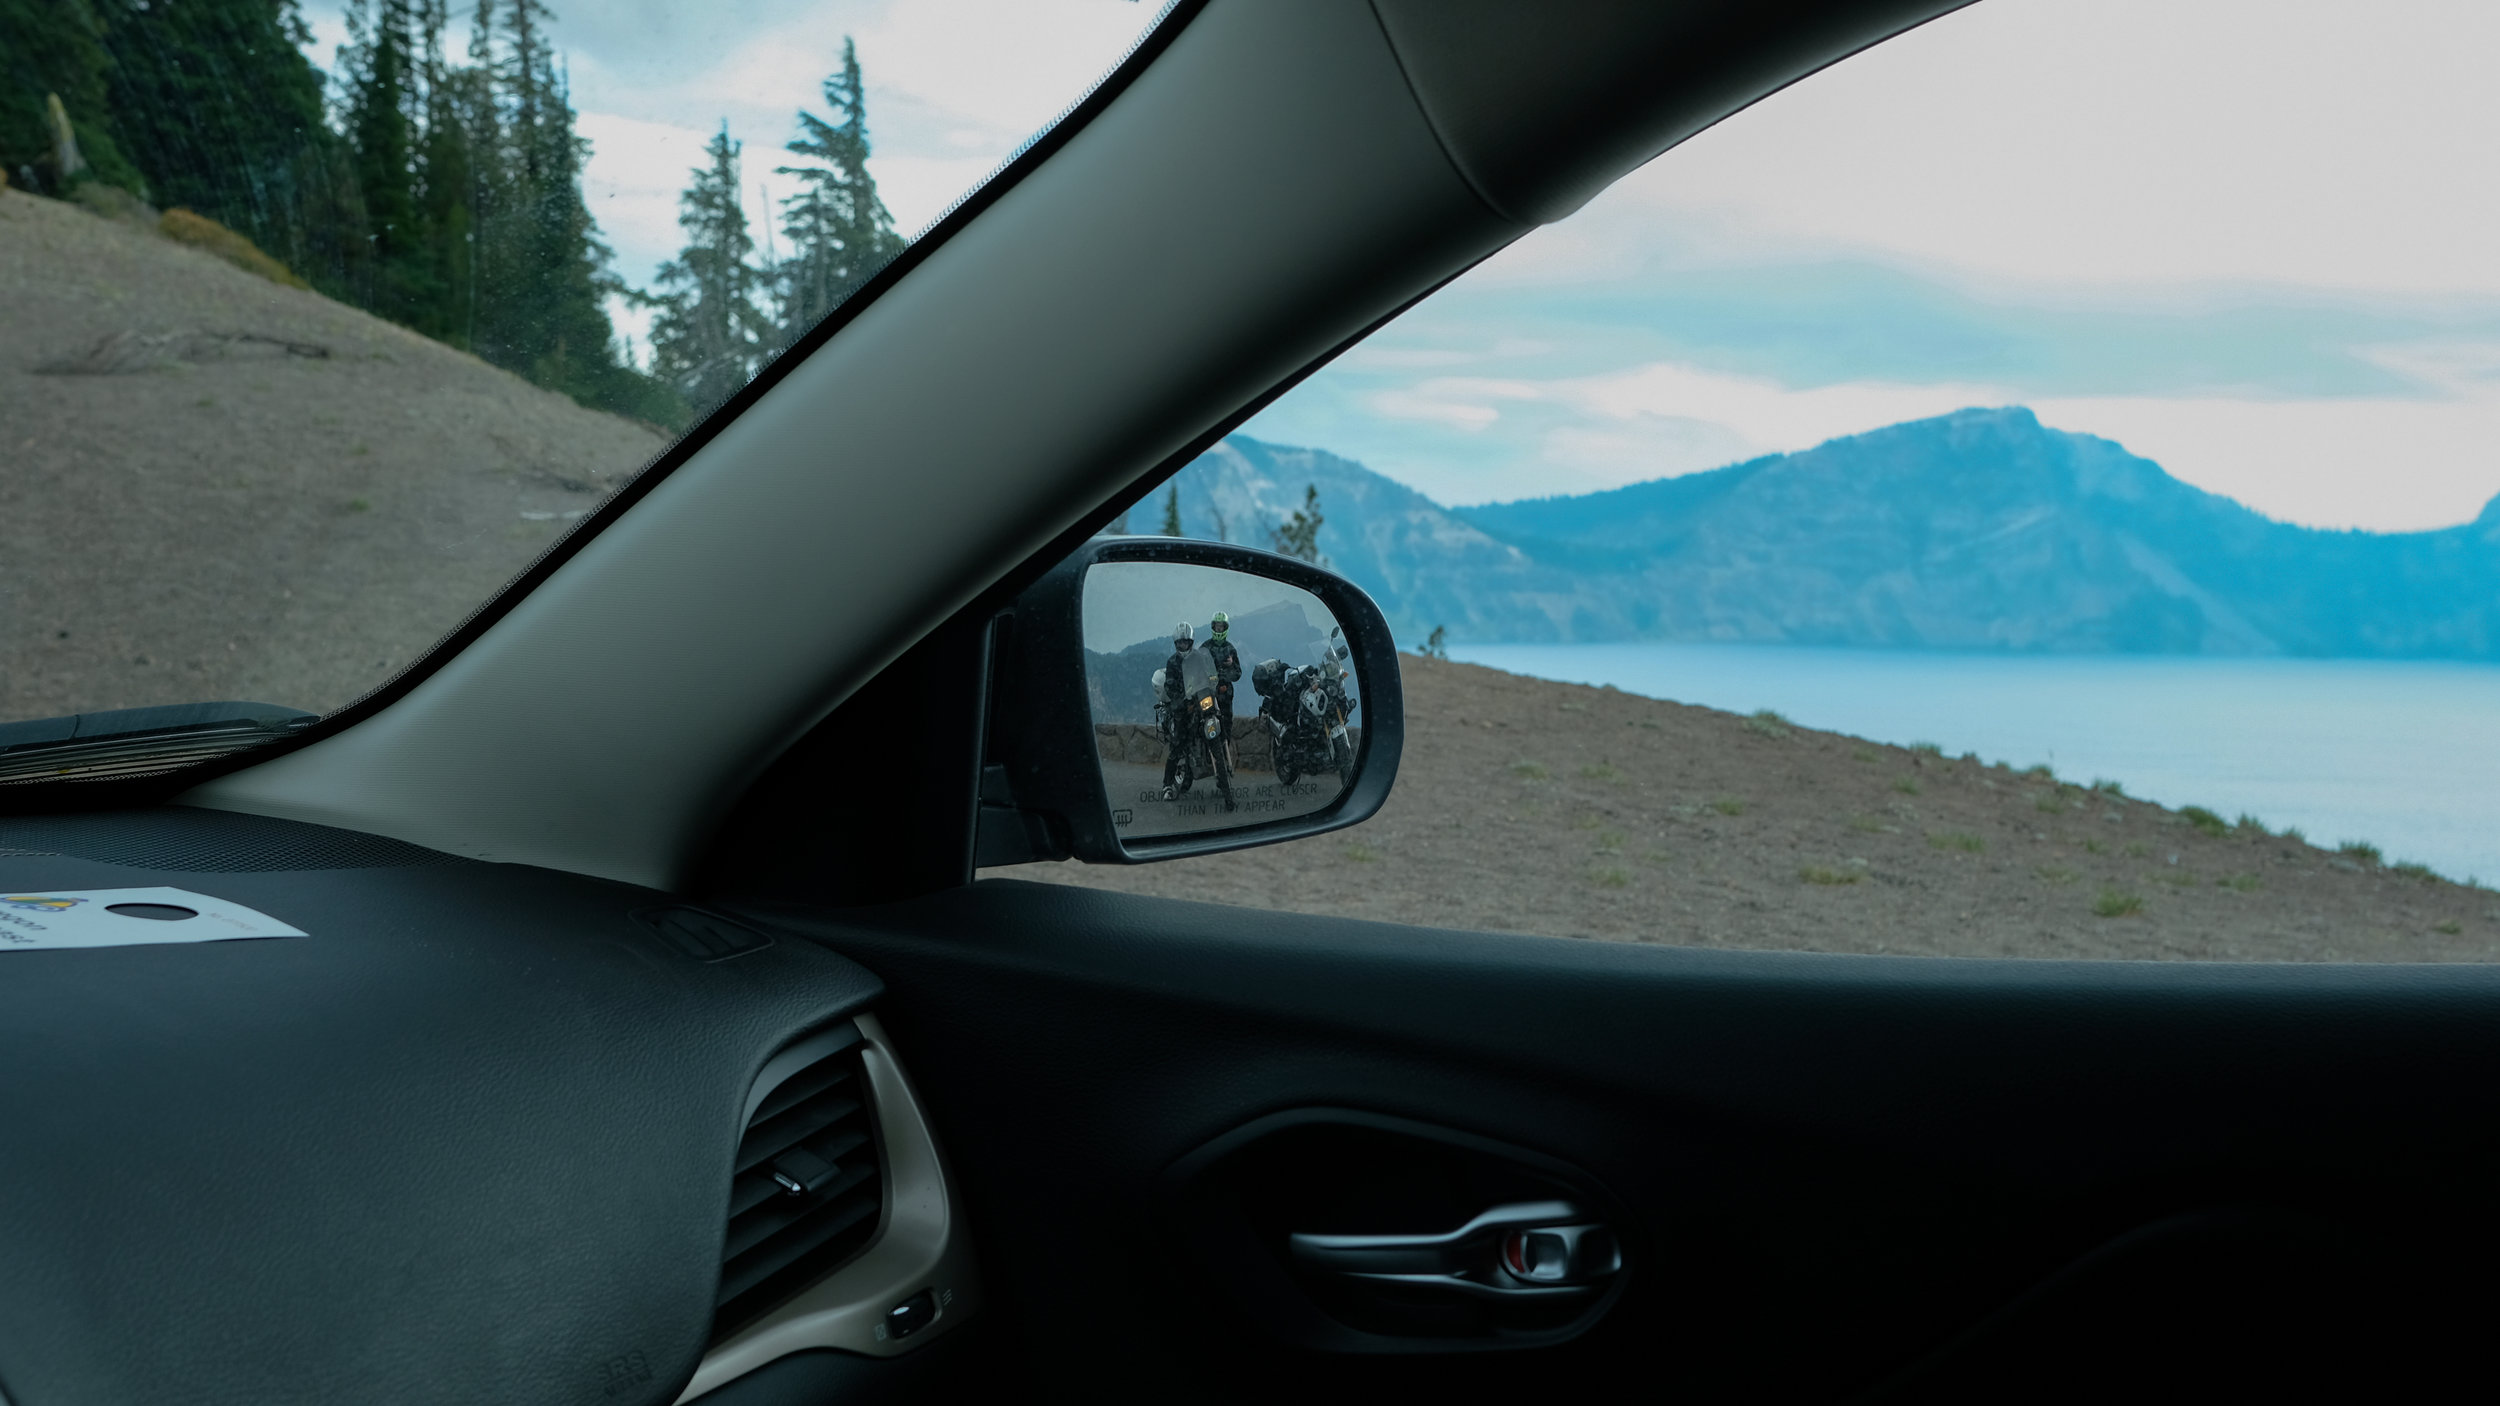 07_Eugine_bikers.jpg